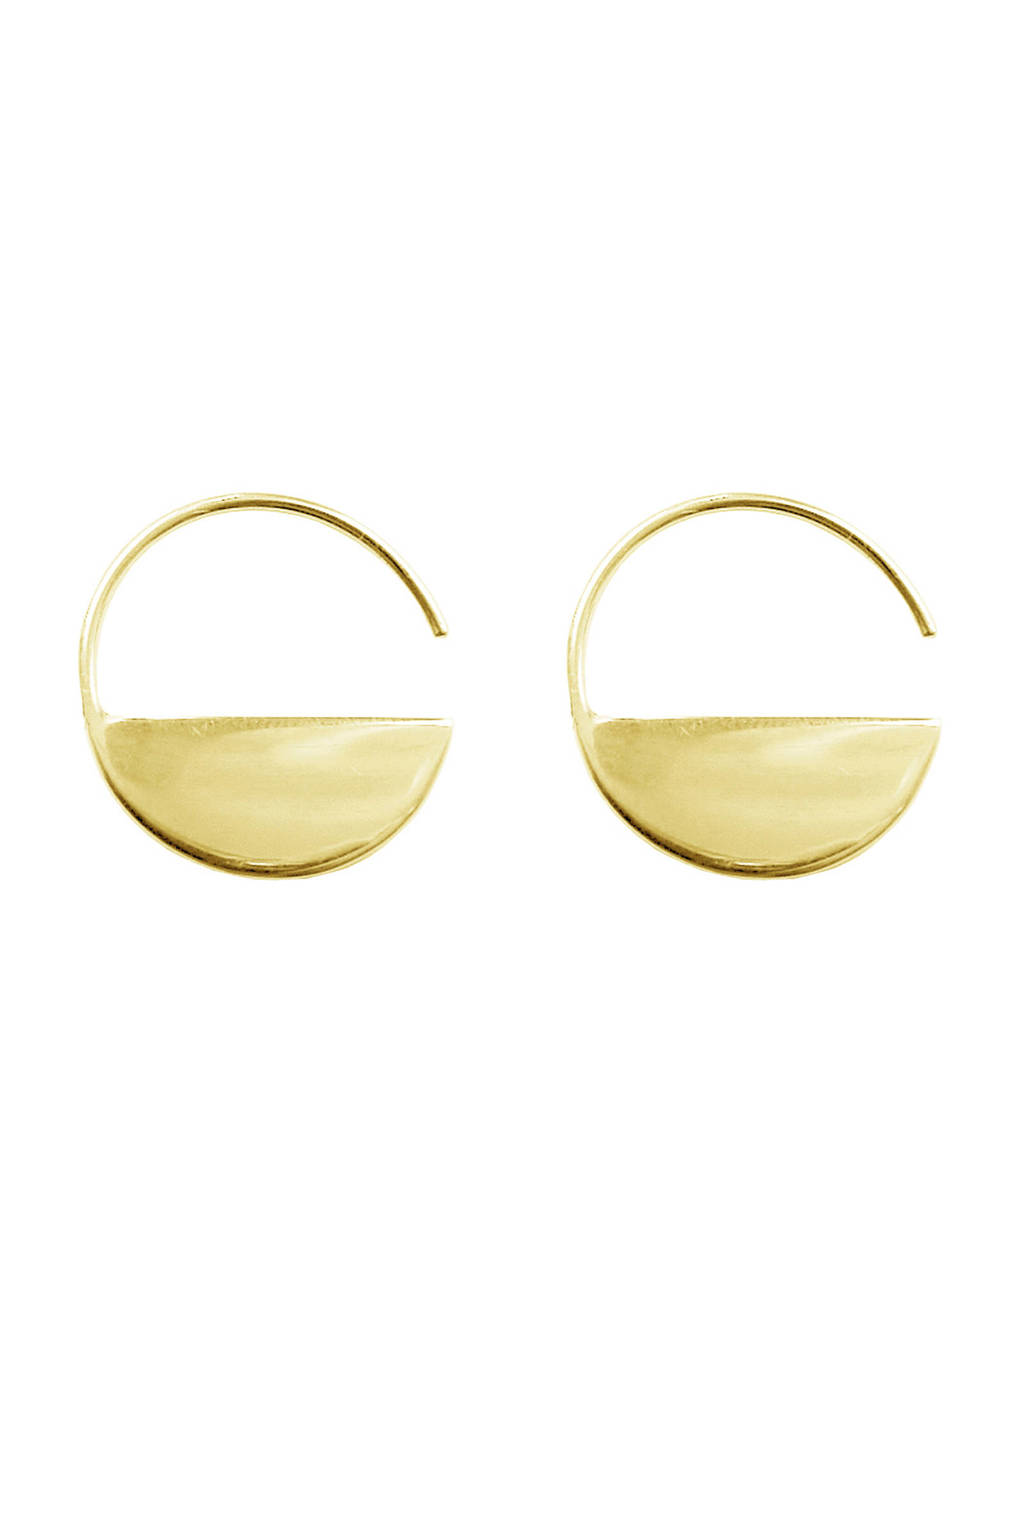 Bandhu Horizon oorbellen plated gold, Goud